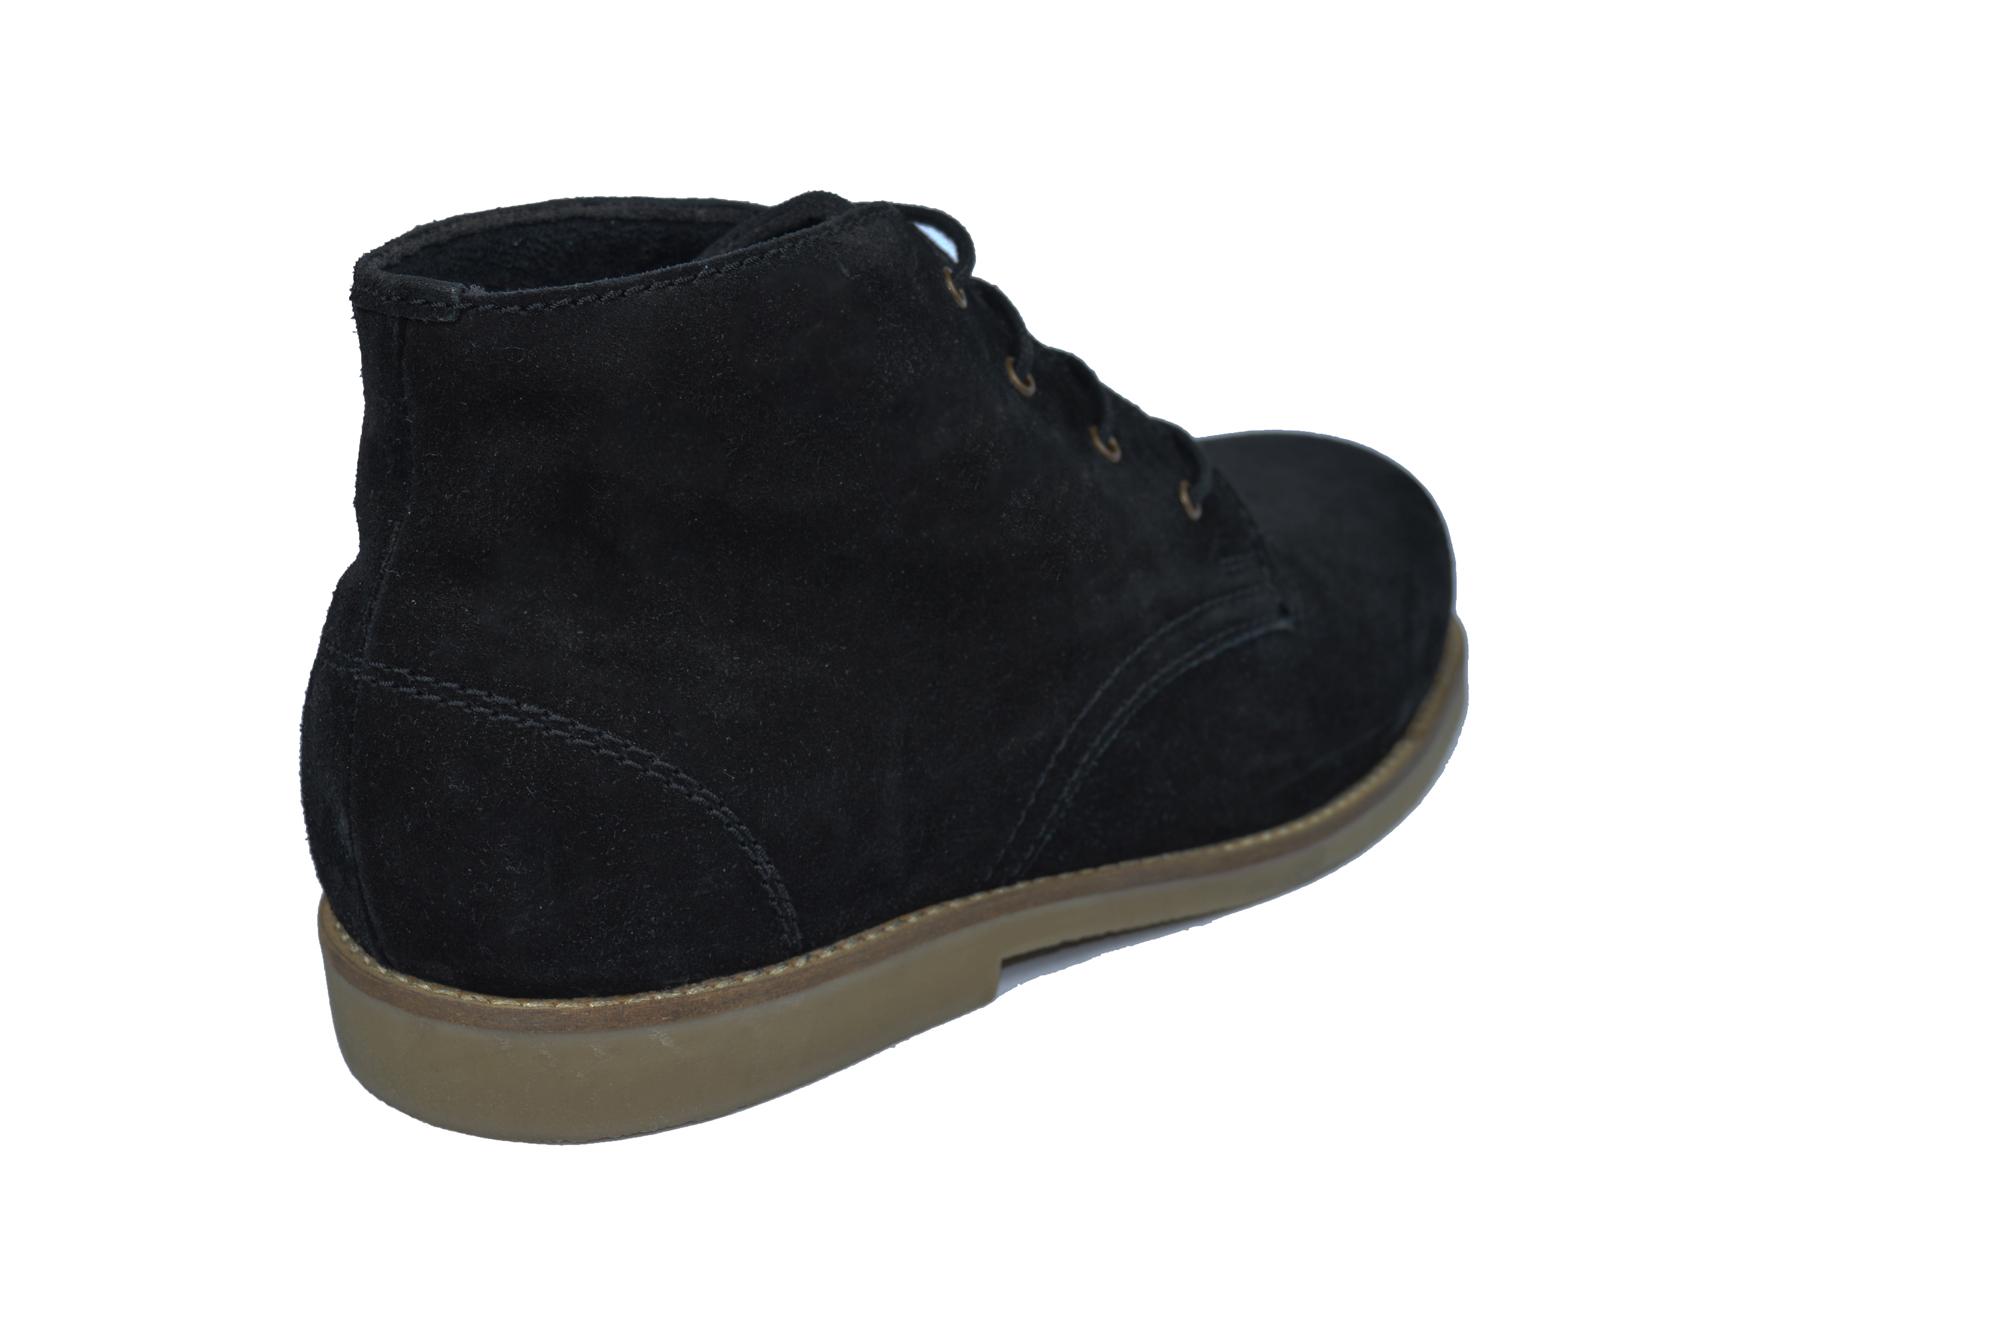 mens desert boots in wide fitting 4e antonio pacelli